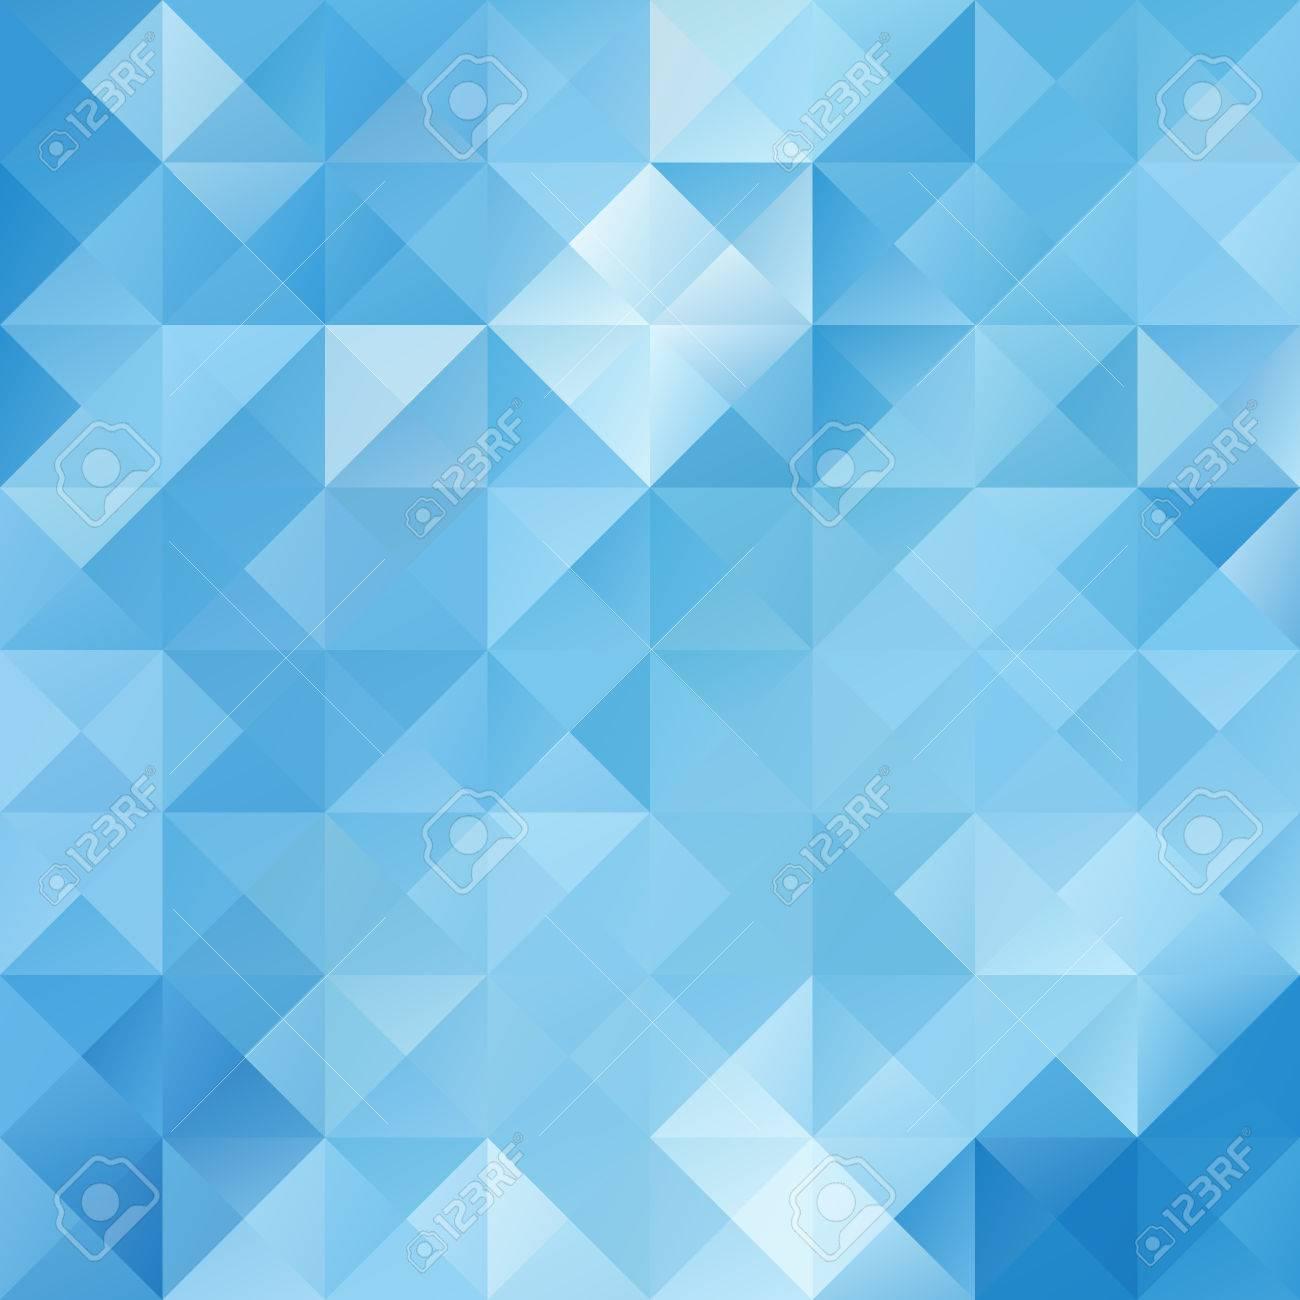 Blue Bright Mosaic Background, Creative Design Templates Royalty ...